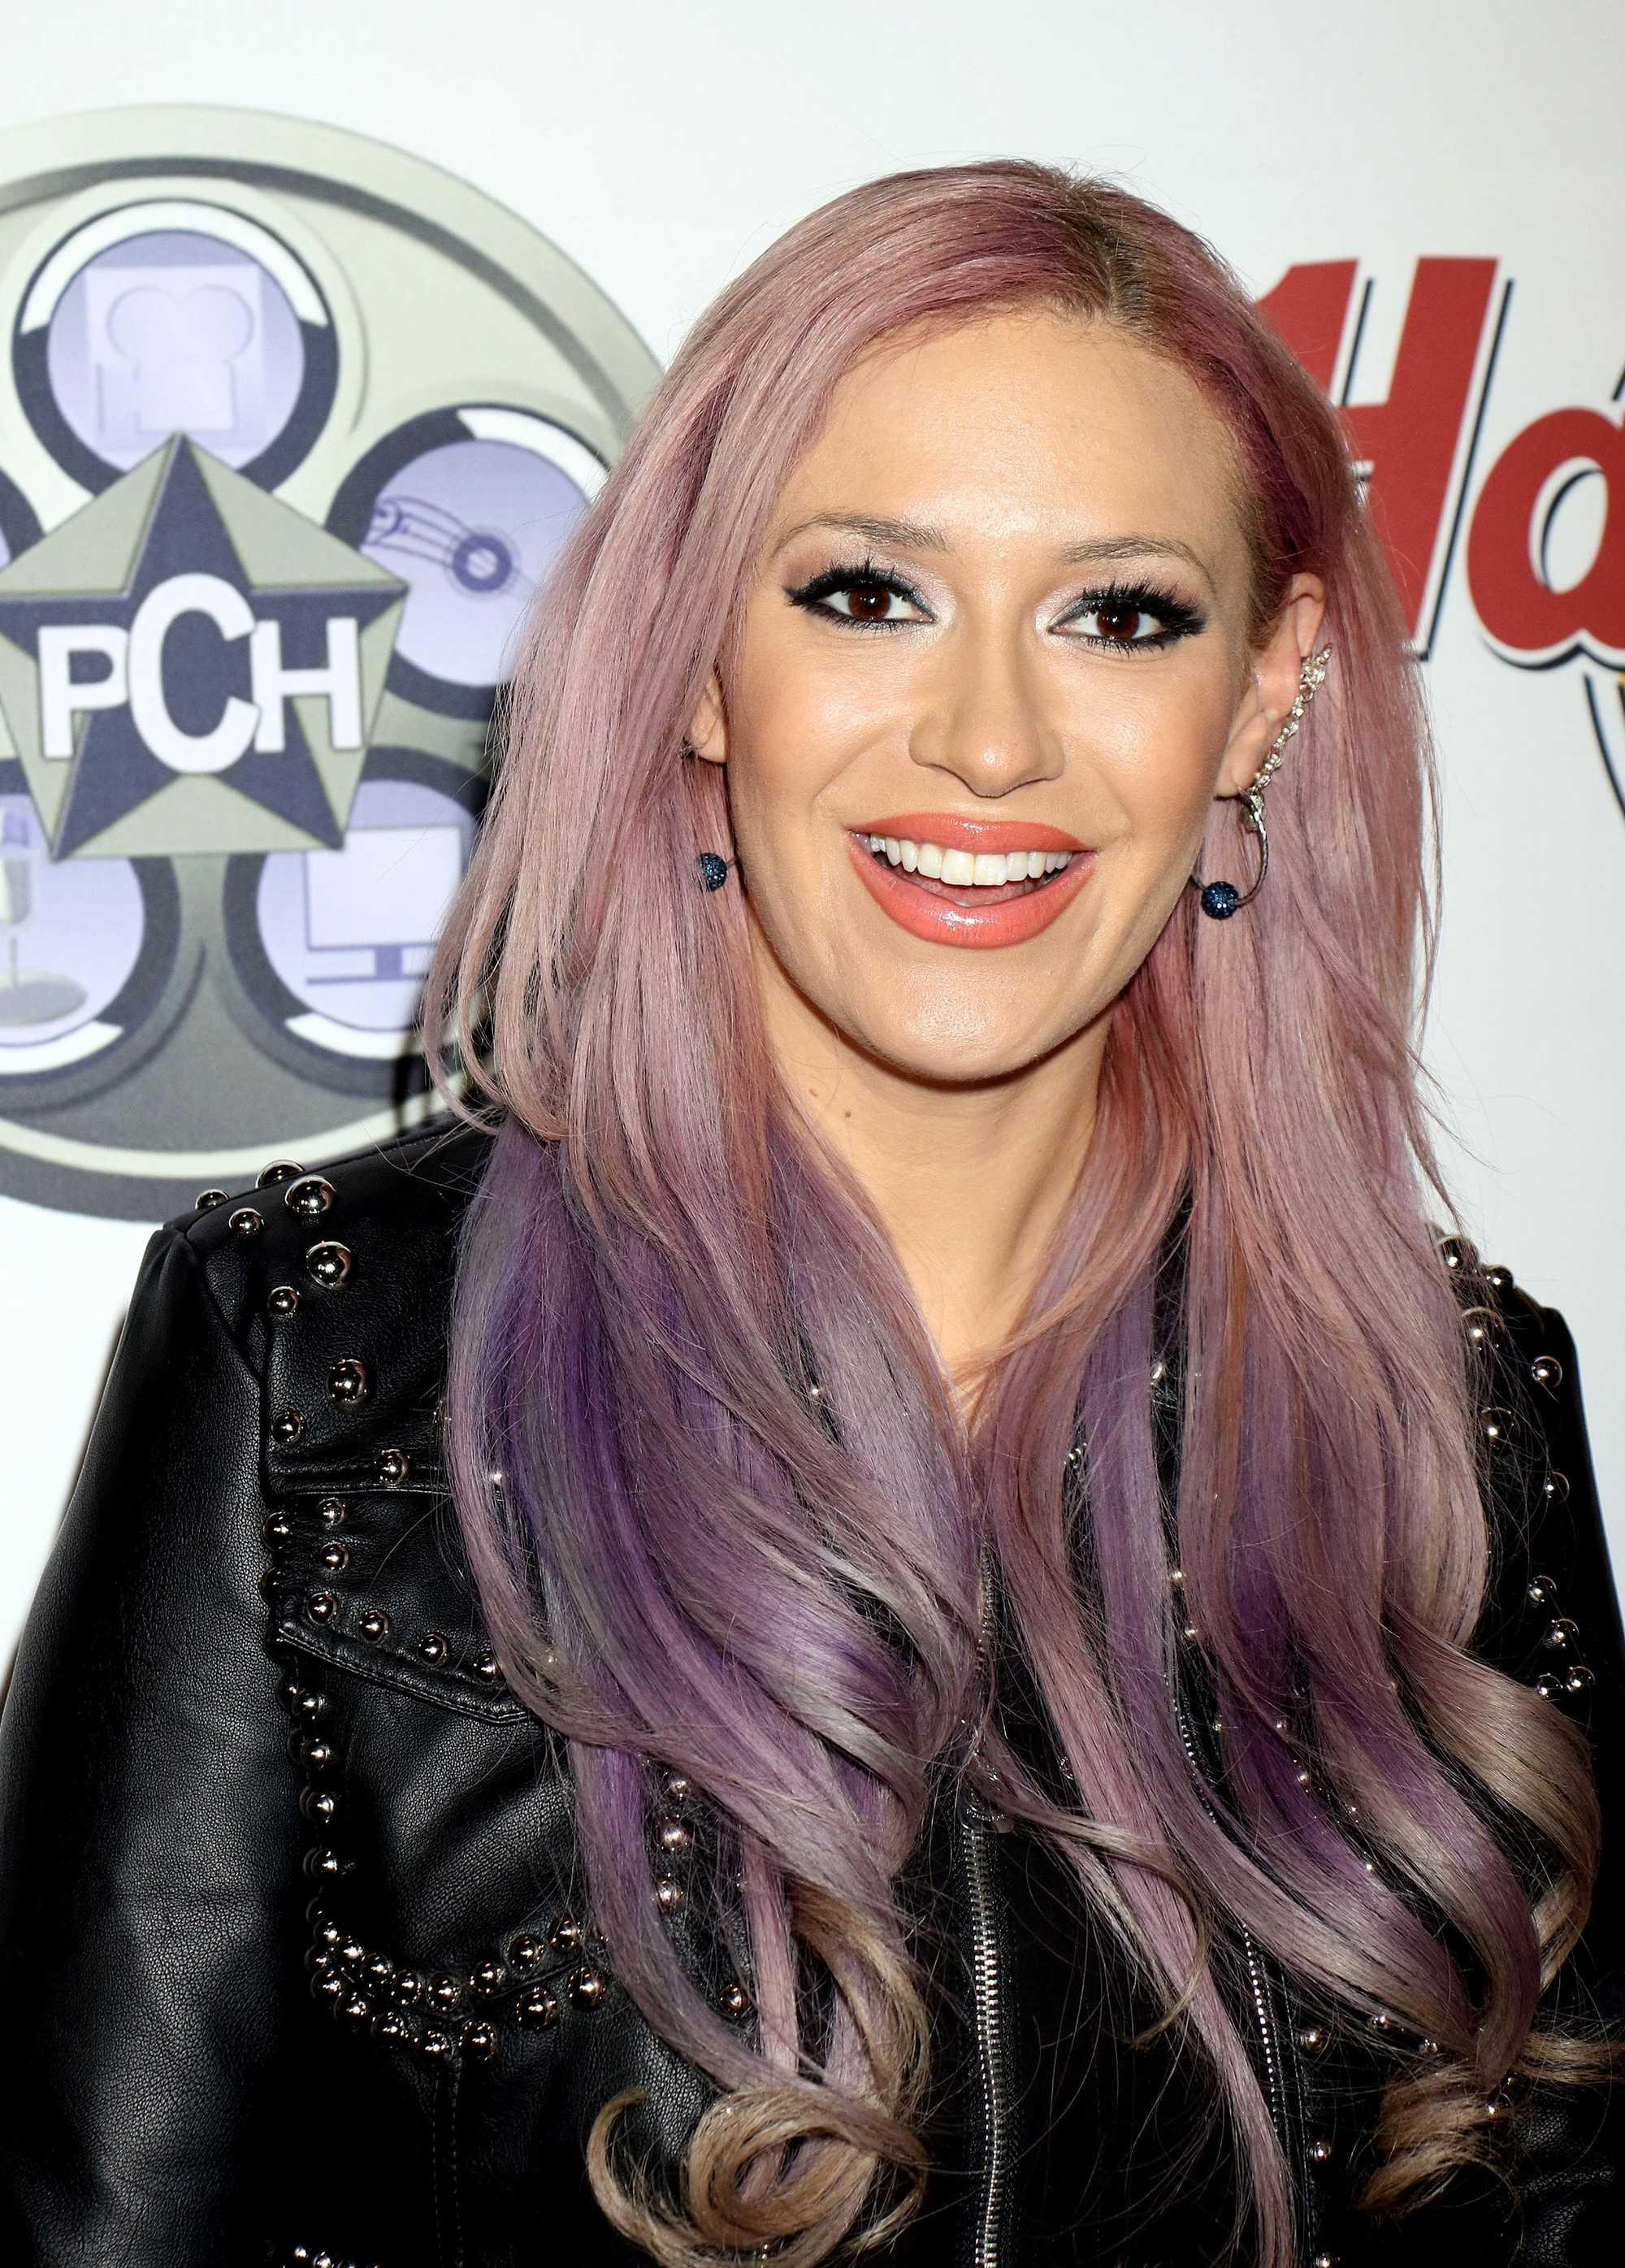 kayah jones with long purple hair on the red carpet